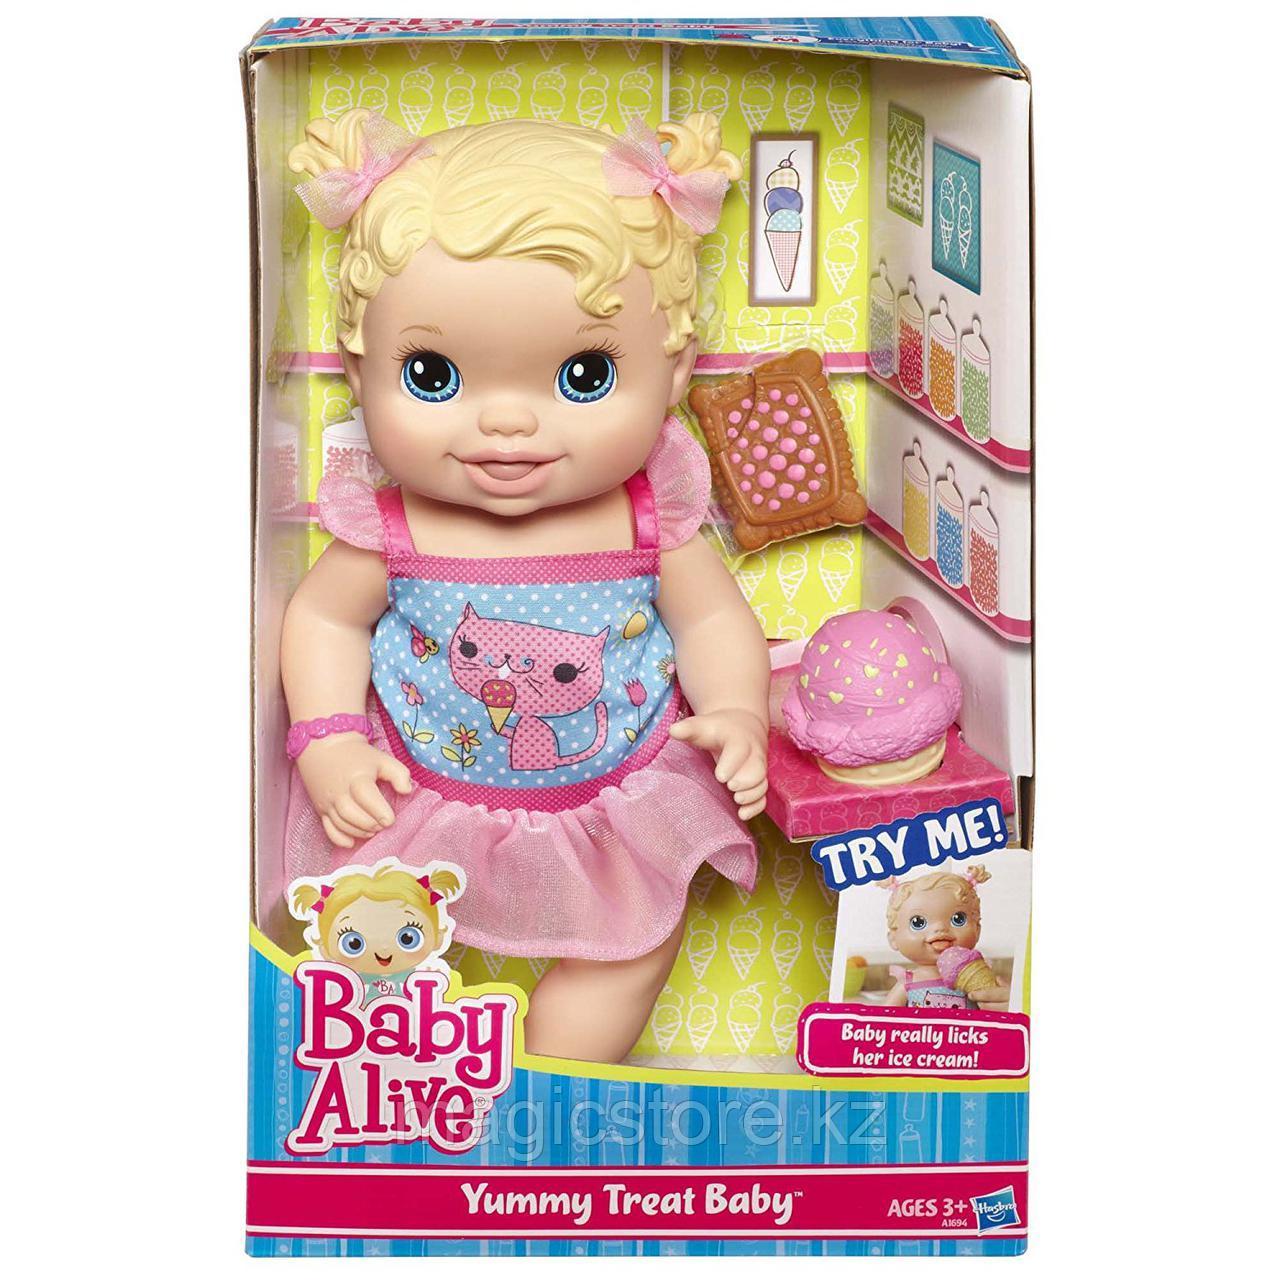 Пупс Hasbro Baby Alive Yummy Treat Baby Угощения для малышки - фото 1